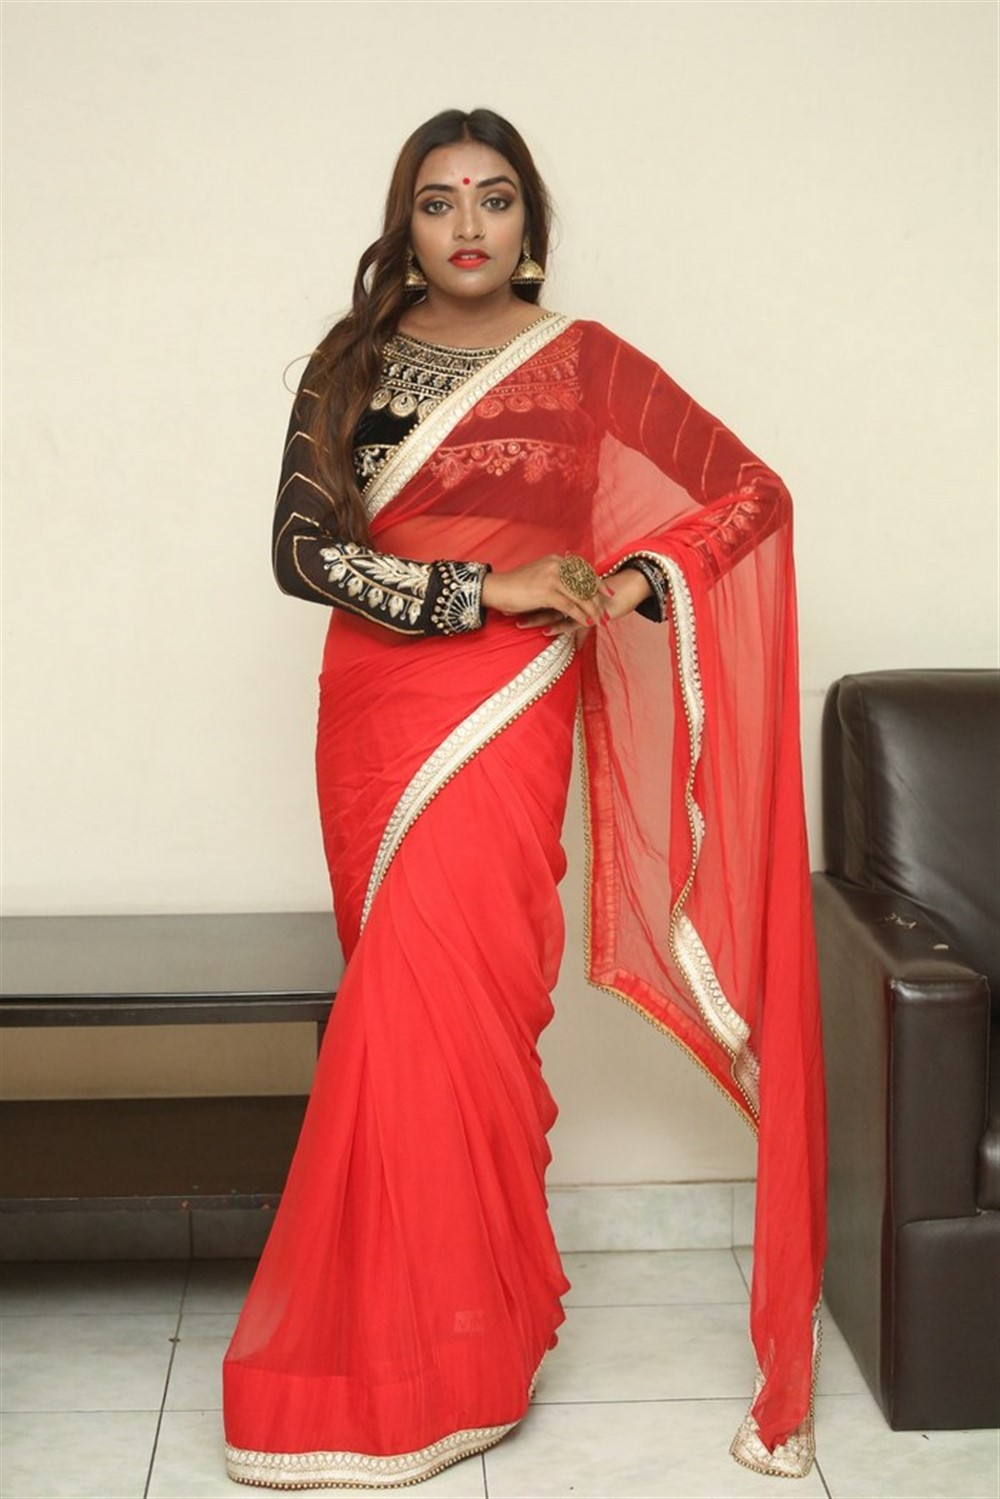 Actress Ashi Roy Pics @ KS 100 Movie Audio Release